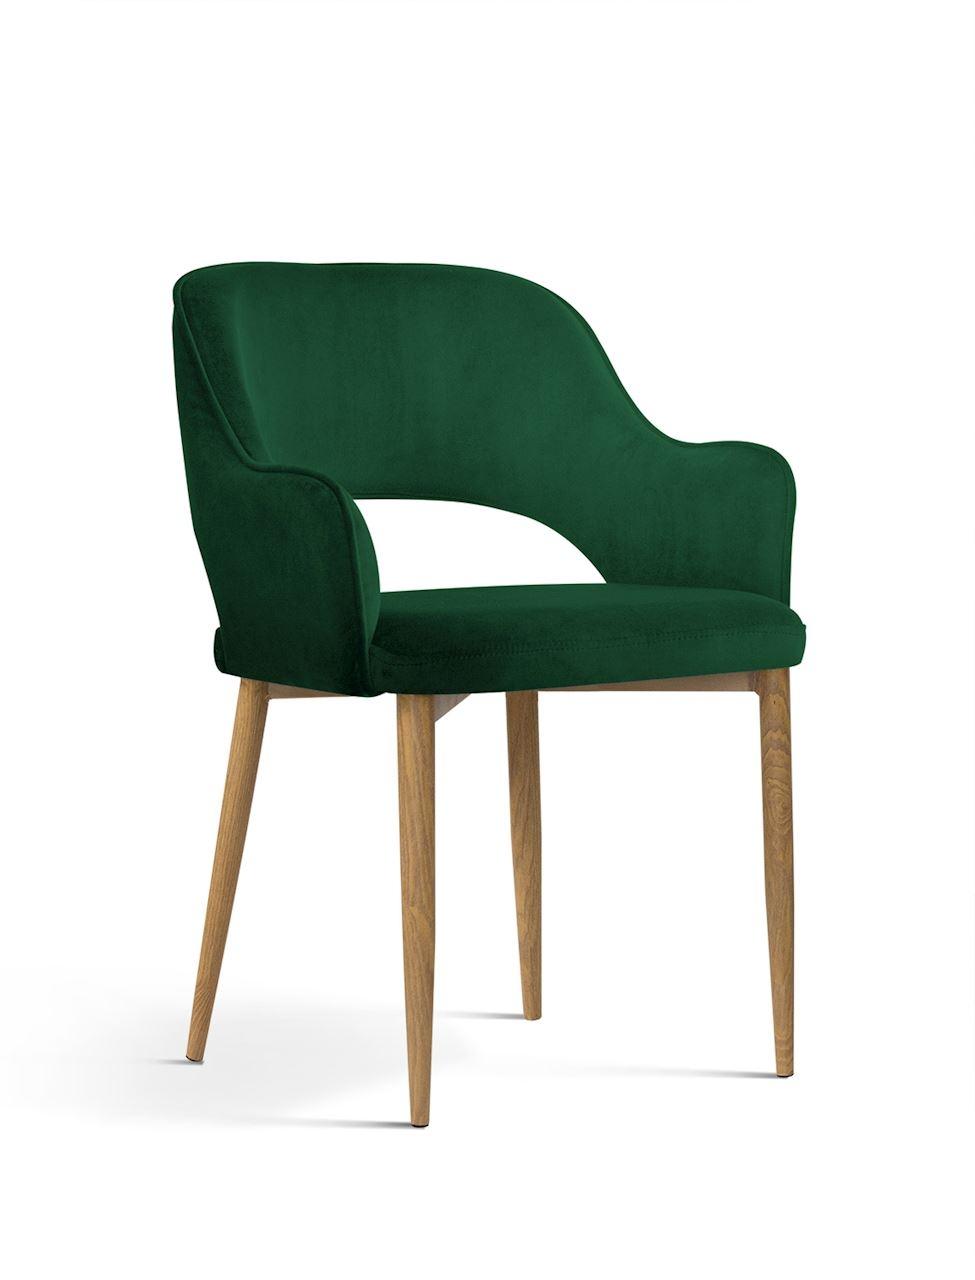 Scaun tapitat cu stofa, cu picioare metalice Mercy Green / Oak, l53xA60xH79 cm